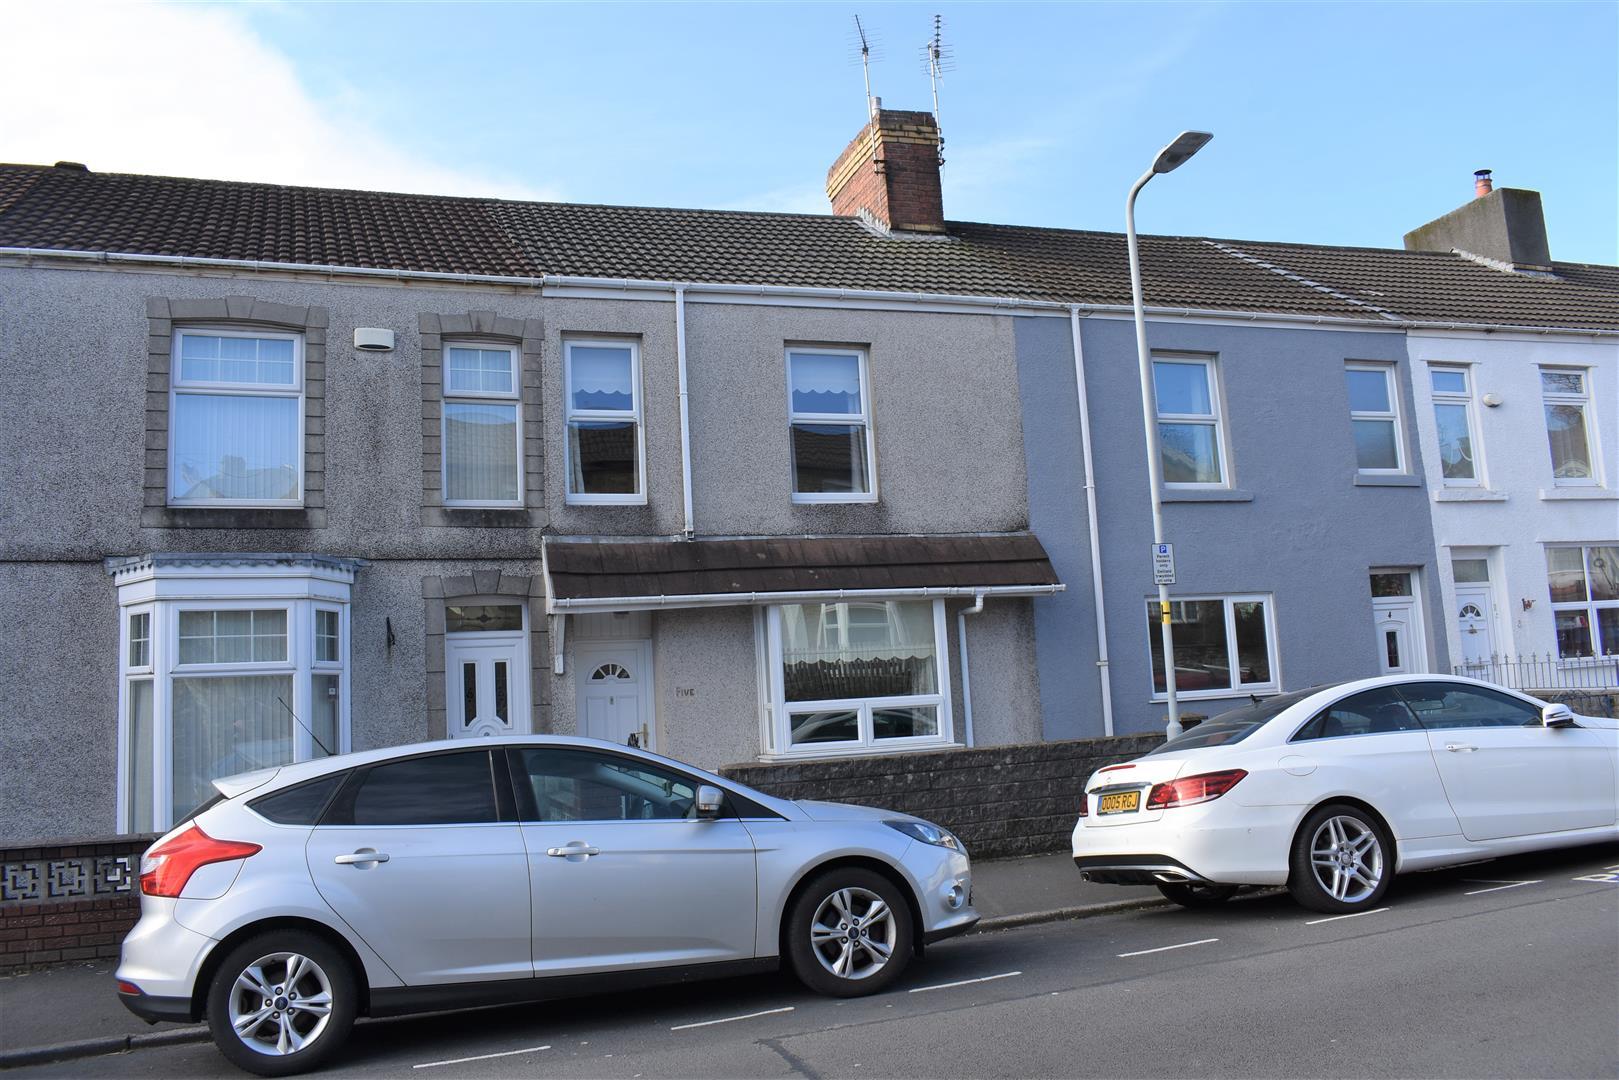 Frogmore Avenue, Sketty, Swansea, SA2 9DJ